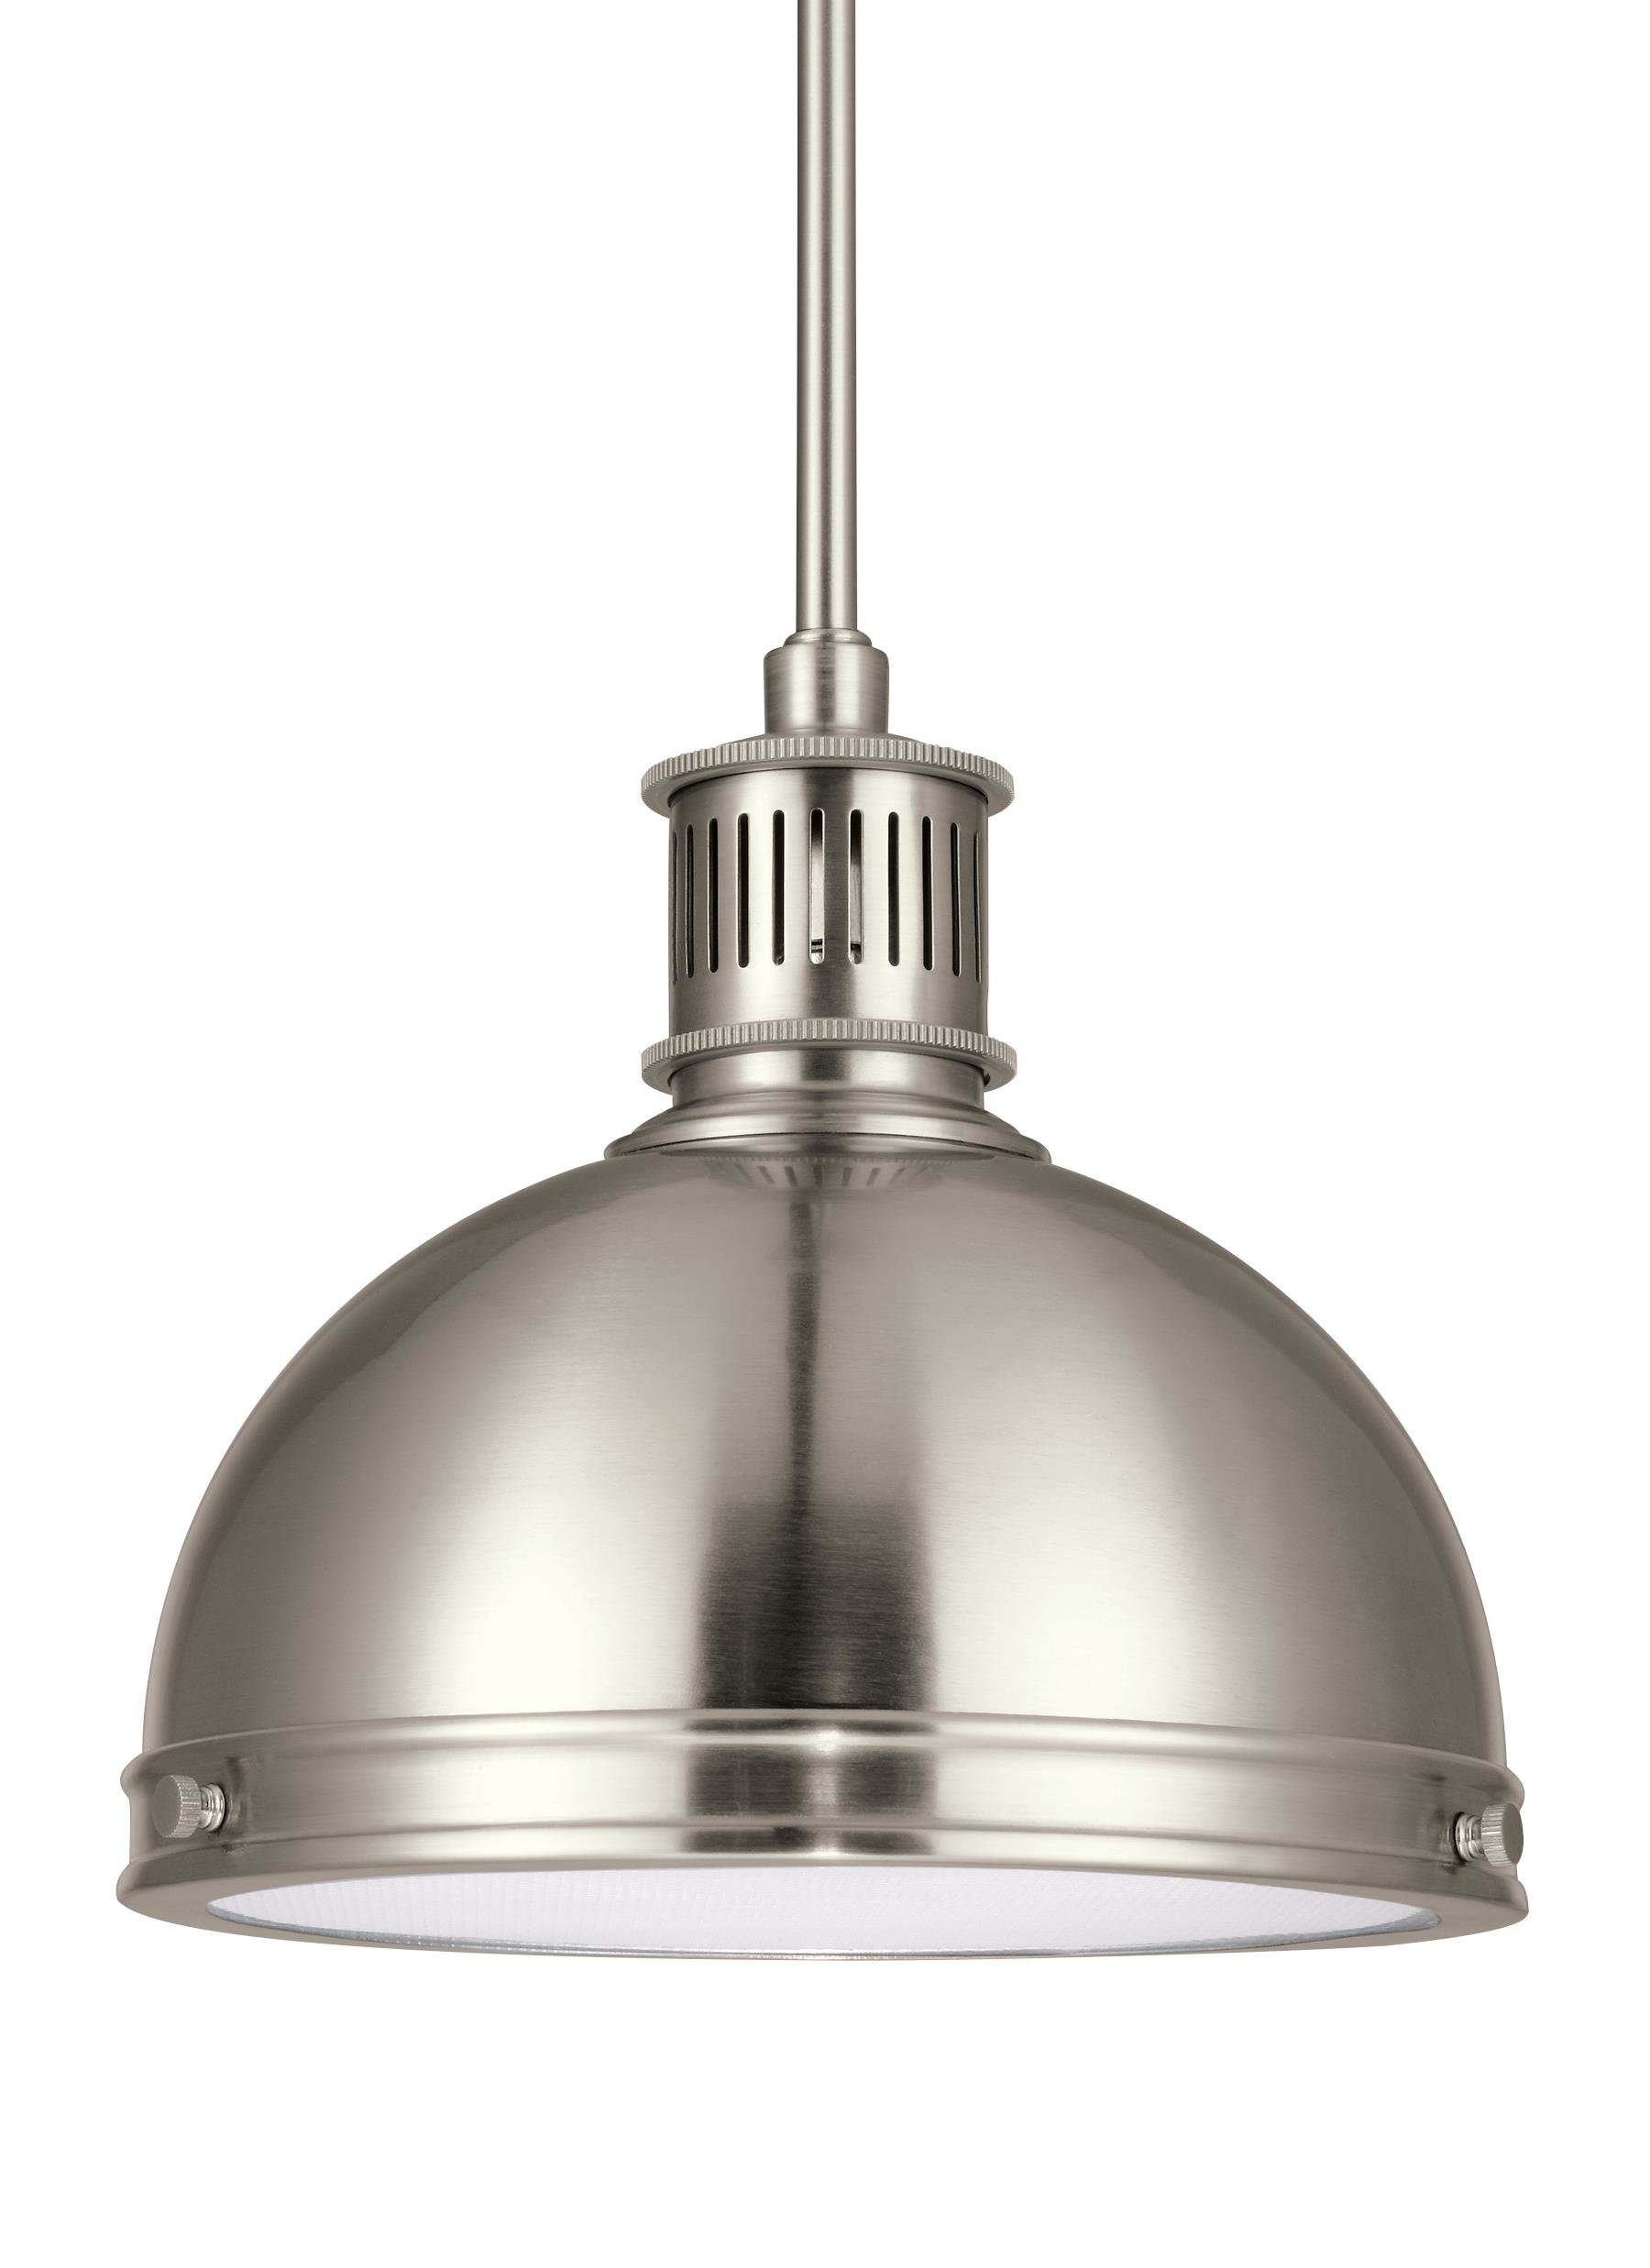 Ninette 1 Light Dome Pendant Regarding Bainbridge 1 Light Single Cylinder Pendants (View 25 of 30)